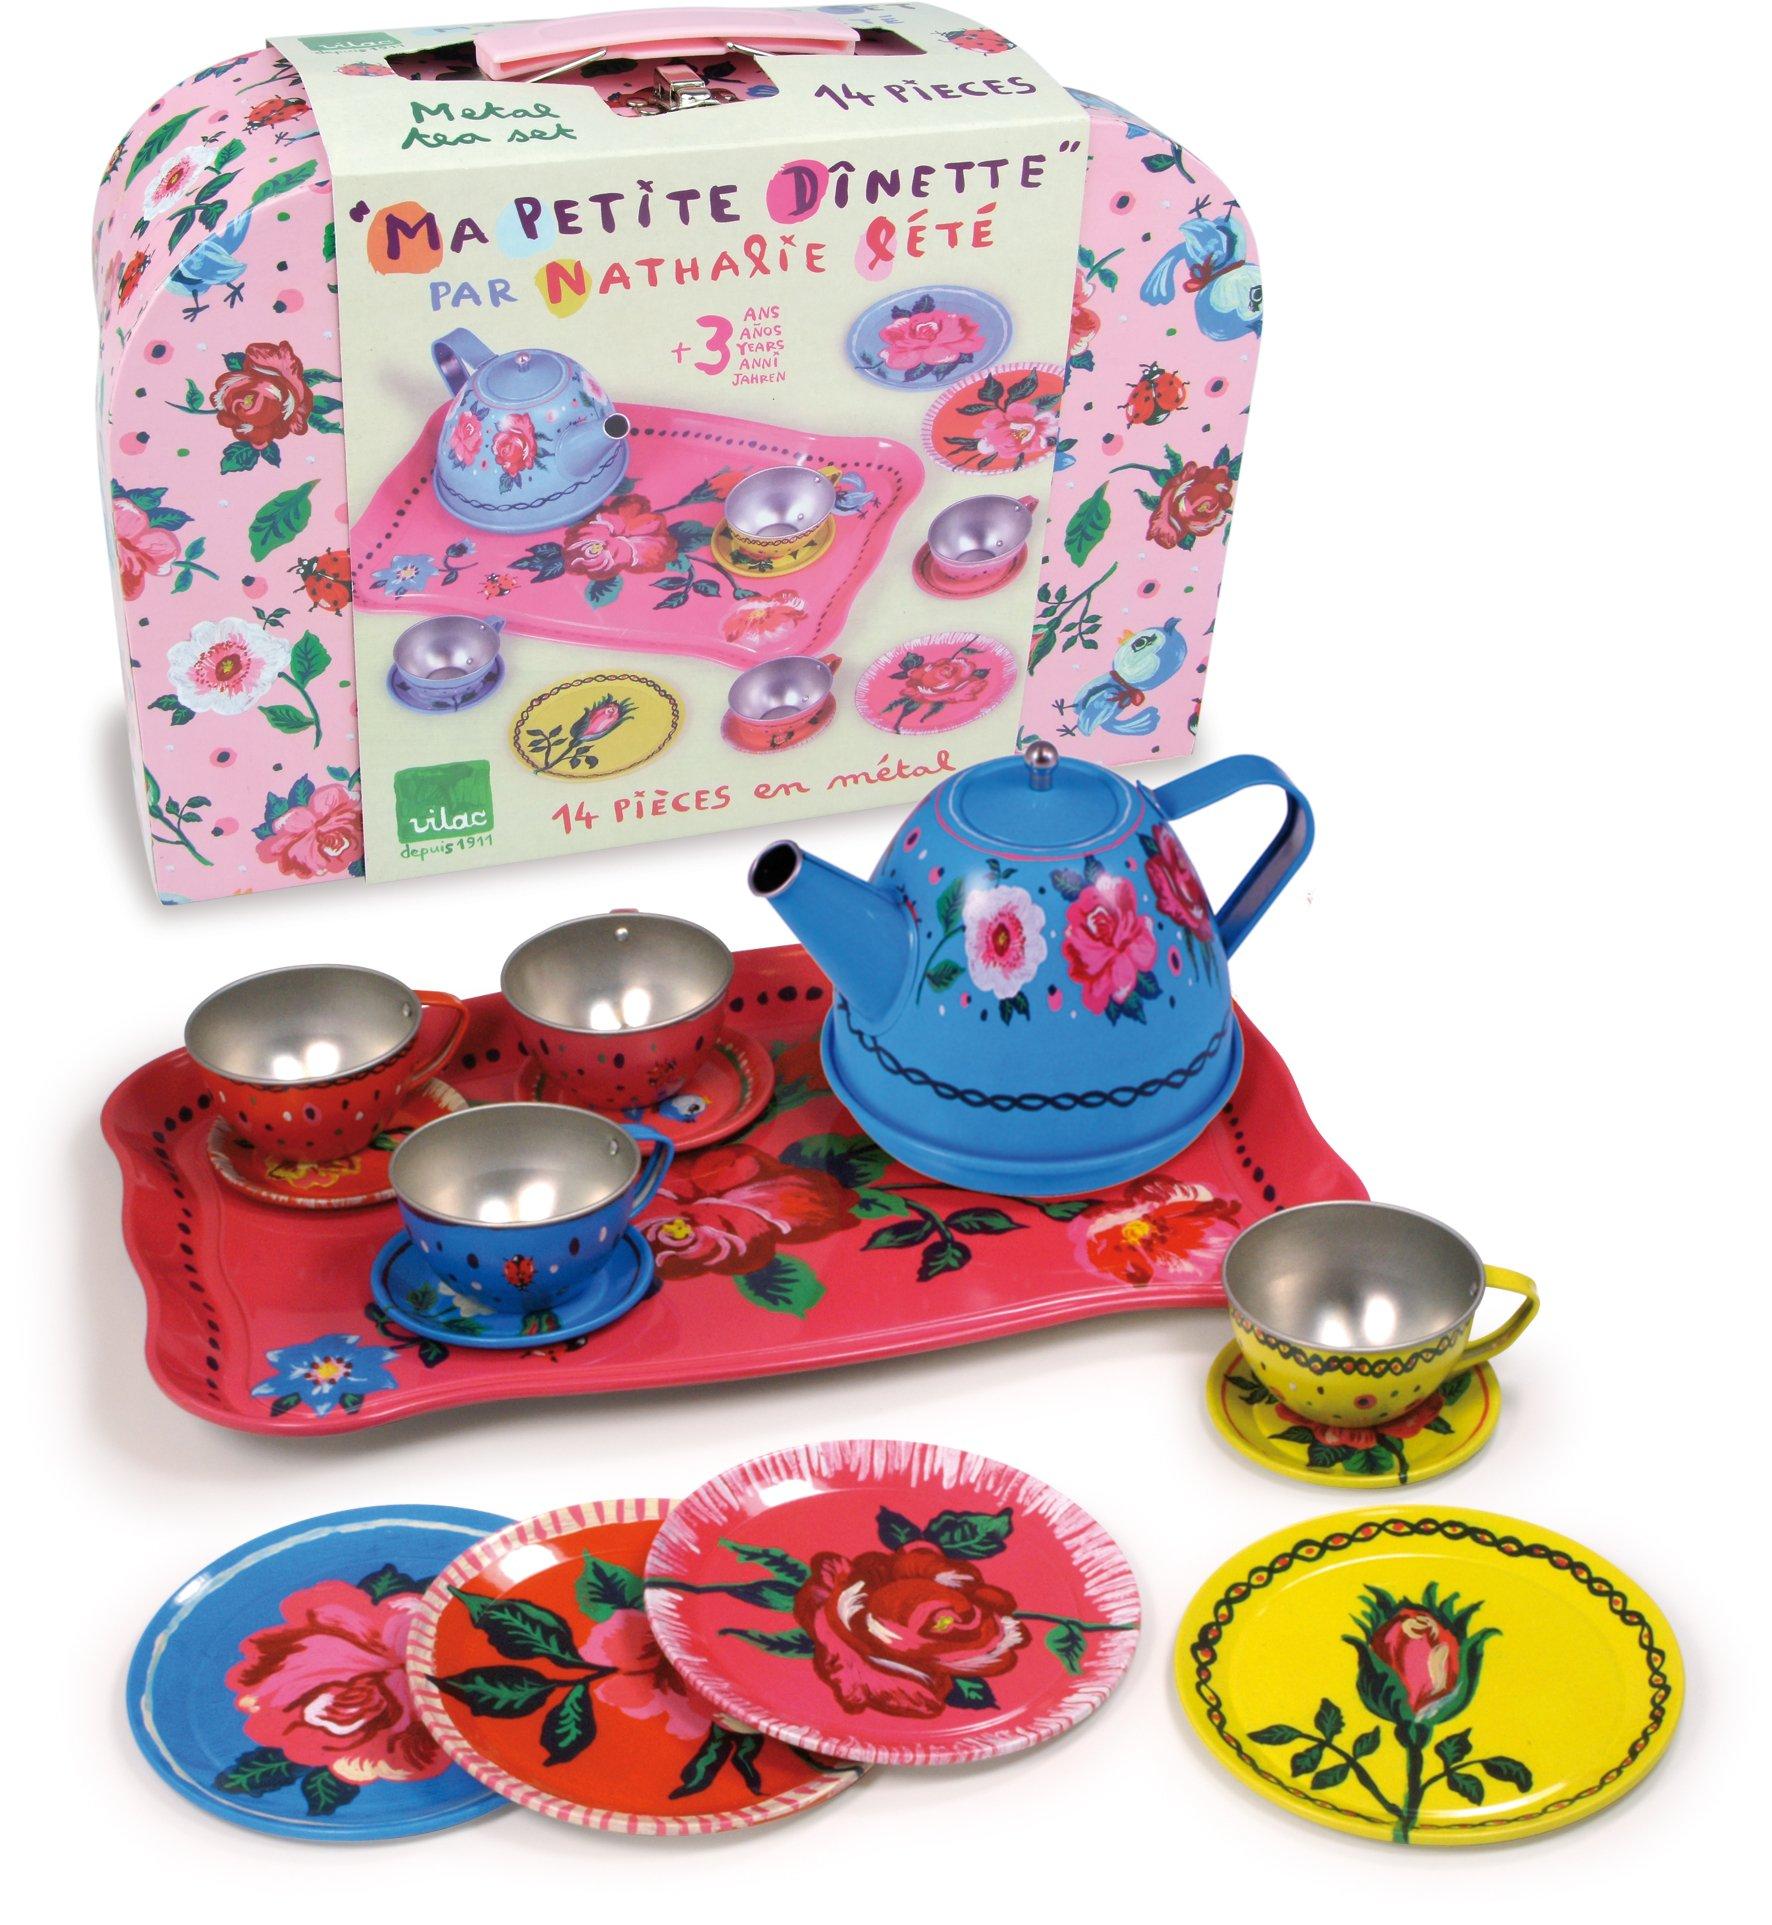 Vilac Retro Metal Tea Party Toy Set 8606